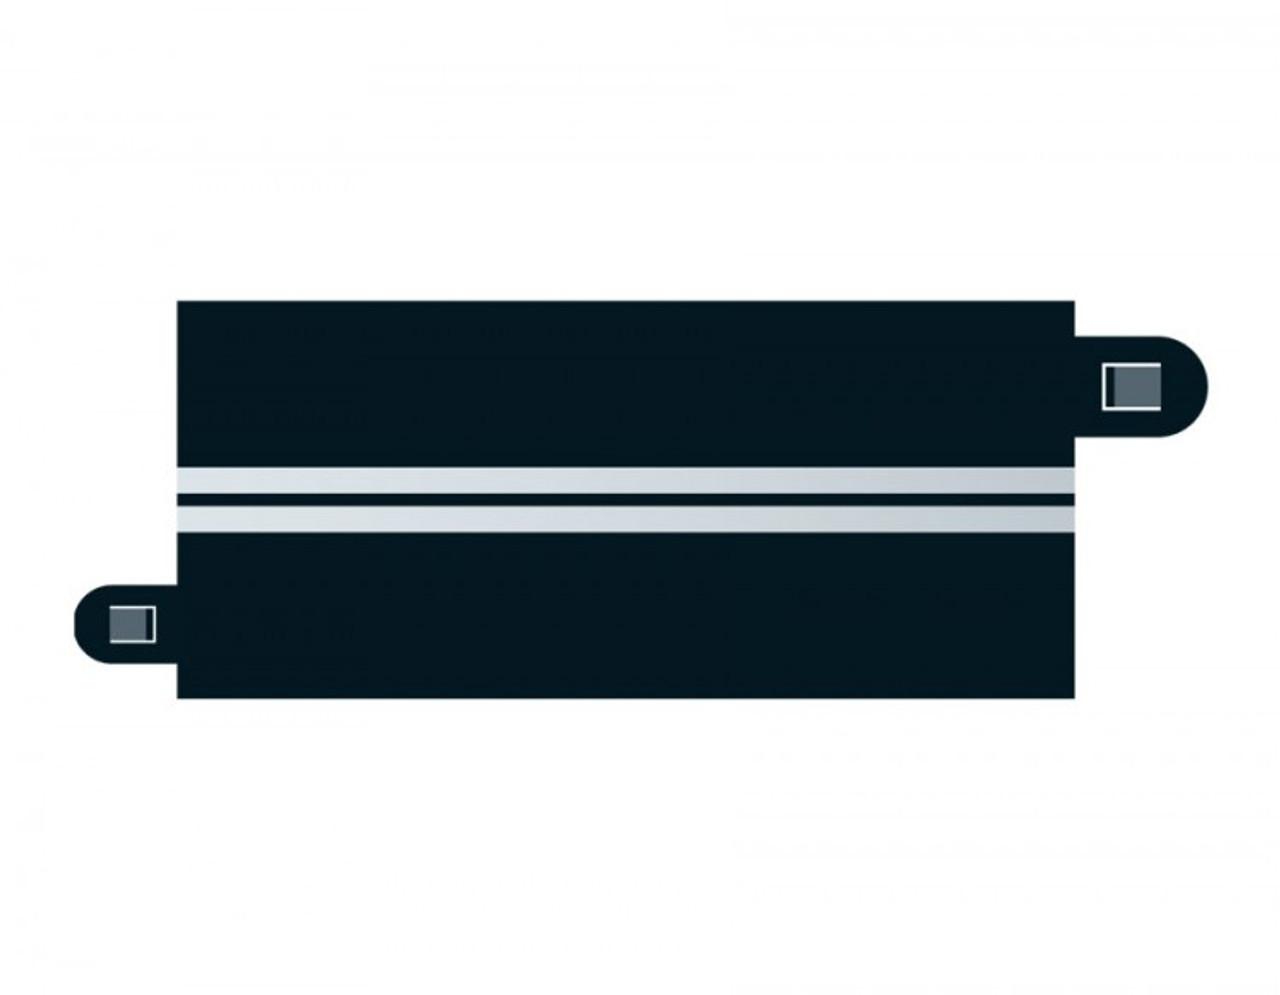 Scalextric C7016 Single Lane Half Straight (4) Slot Car Accessories 1:32